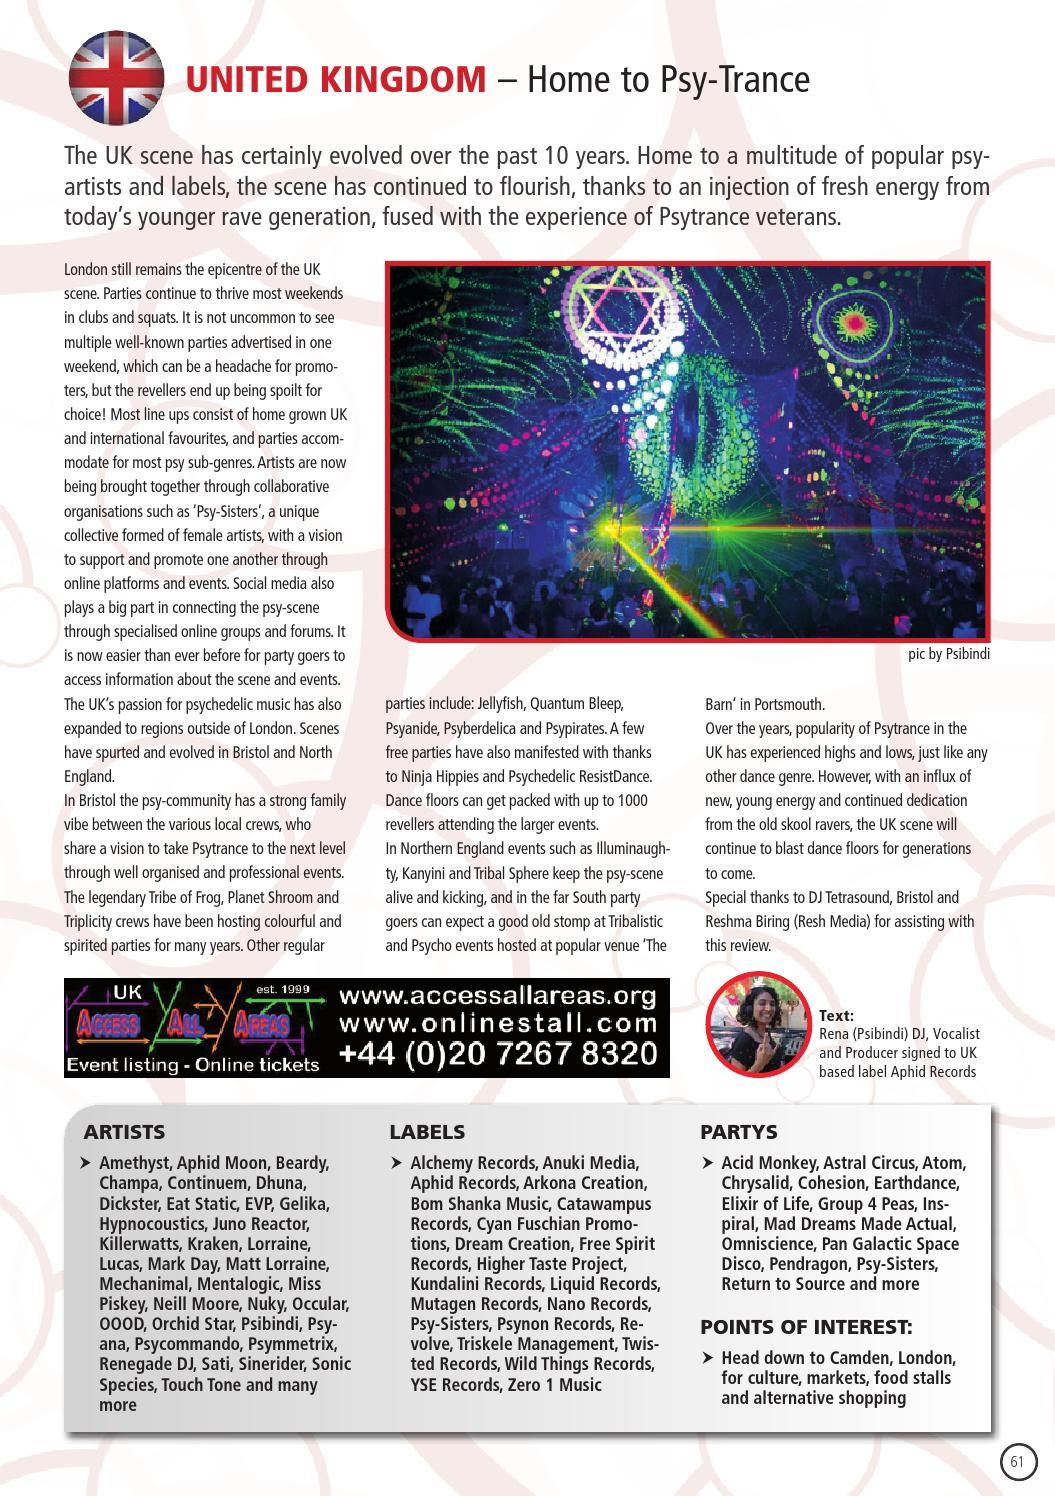 Trancers Guide To The Galaxy 2014 by mushroom magazine - issuu